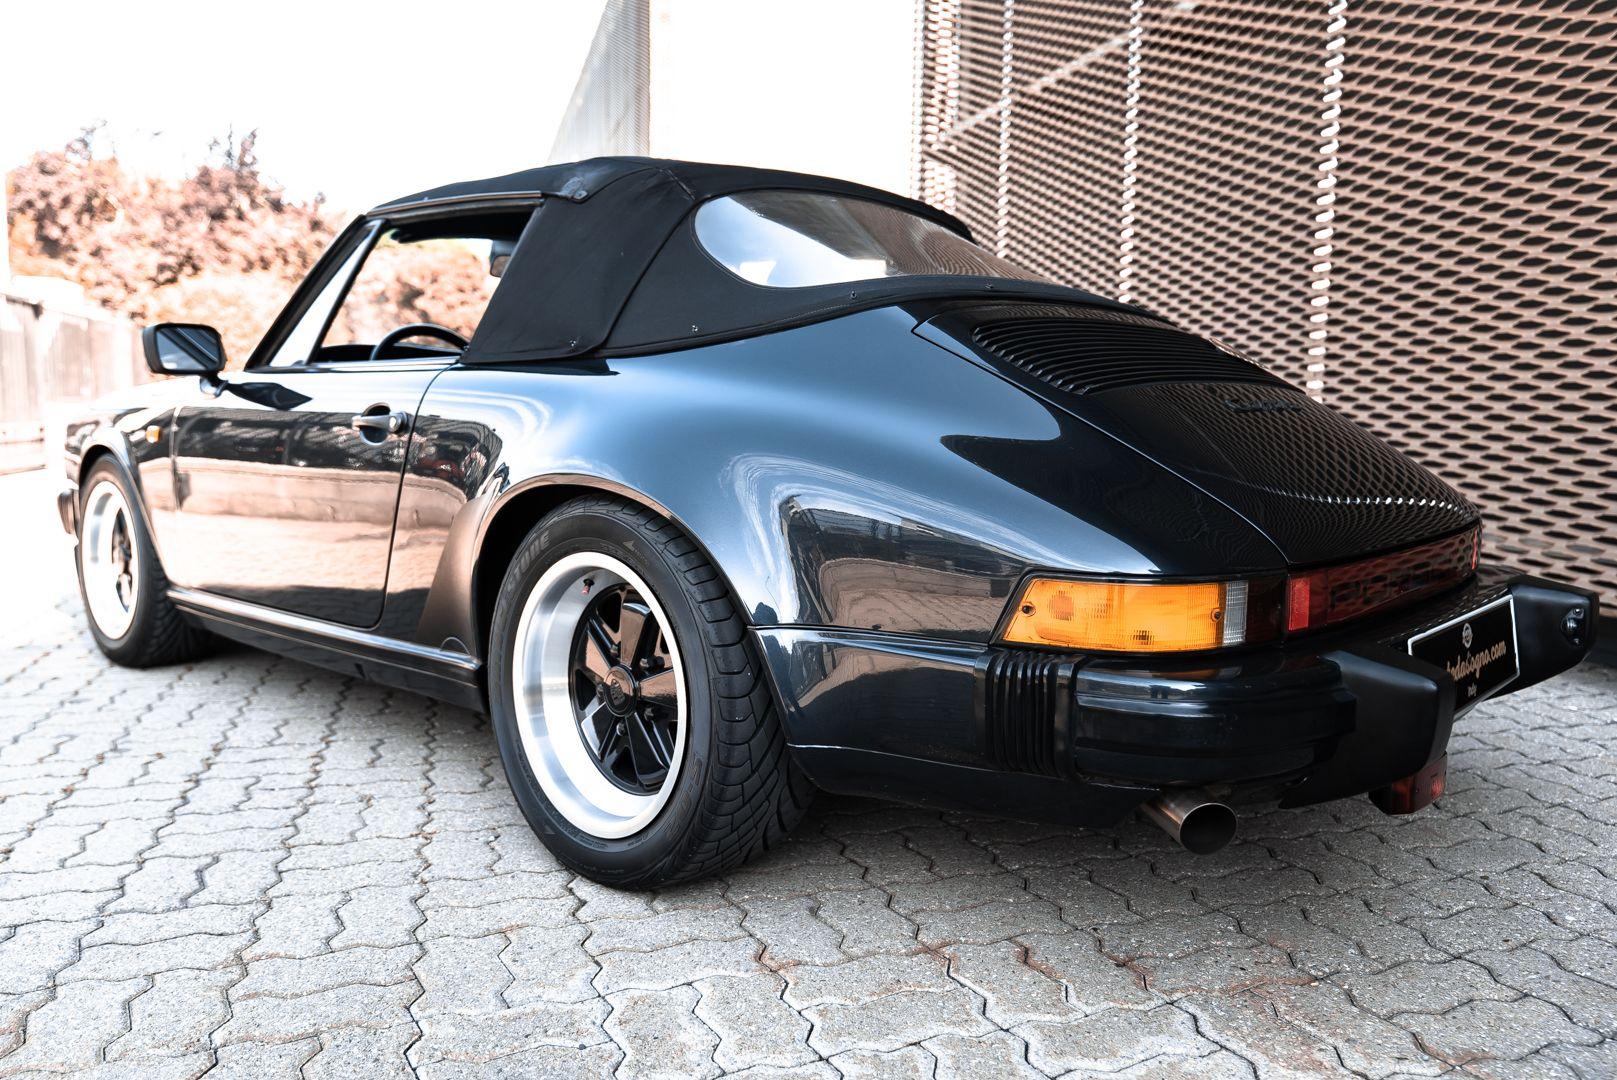 1986 Porsche 911 Carrera 3.2 Cabrio 70896